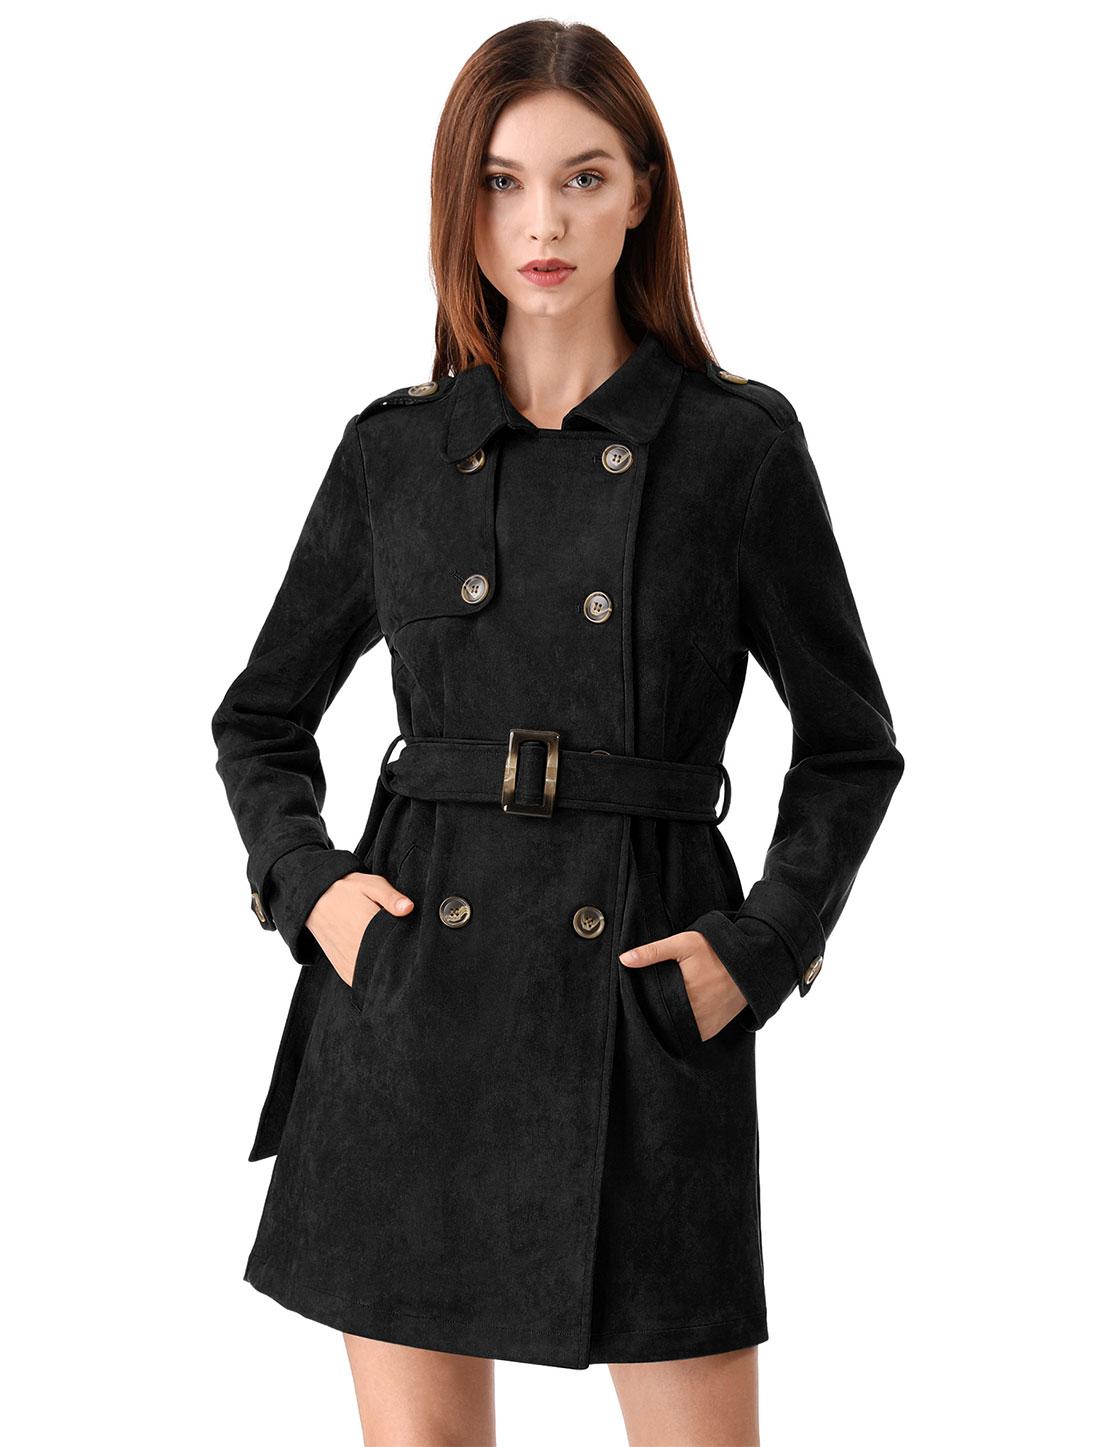 Allegra K Women Faux Suede Trench Coat Jacket with Belt Black S